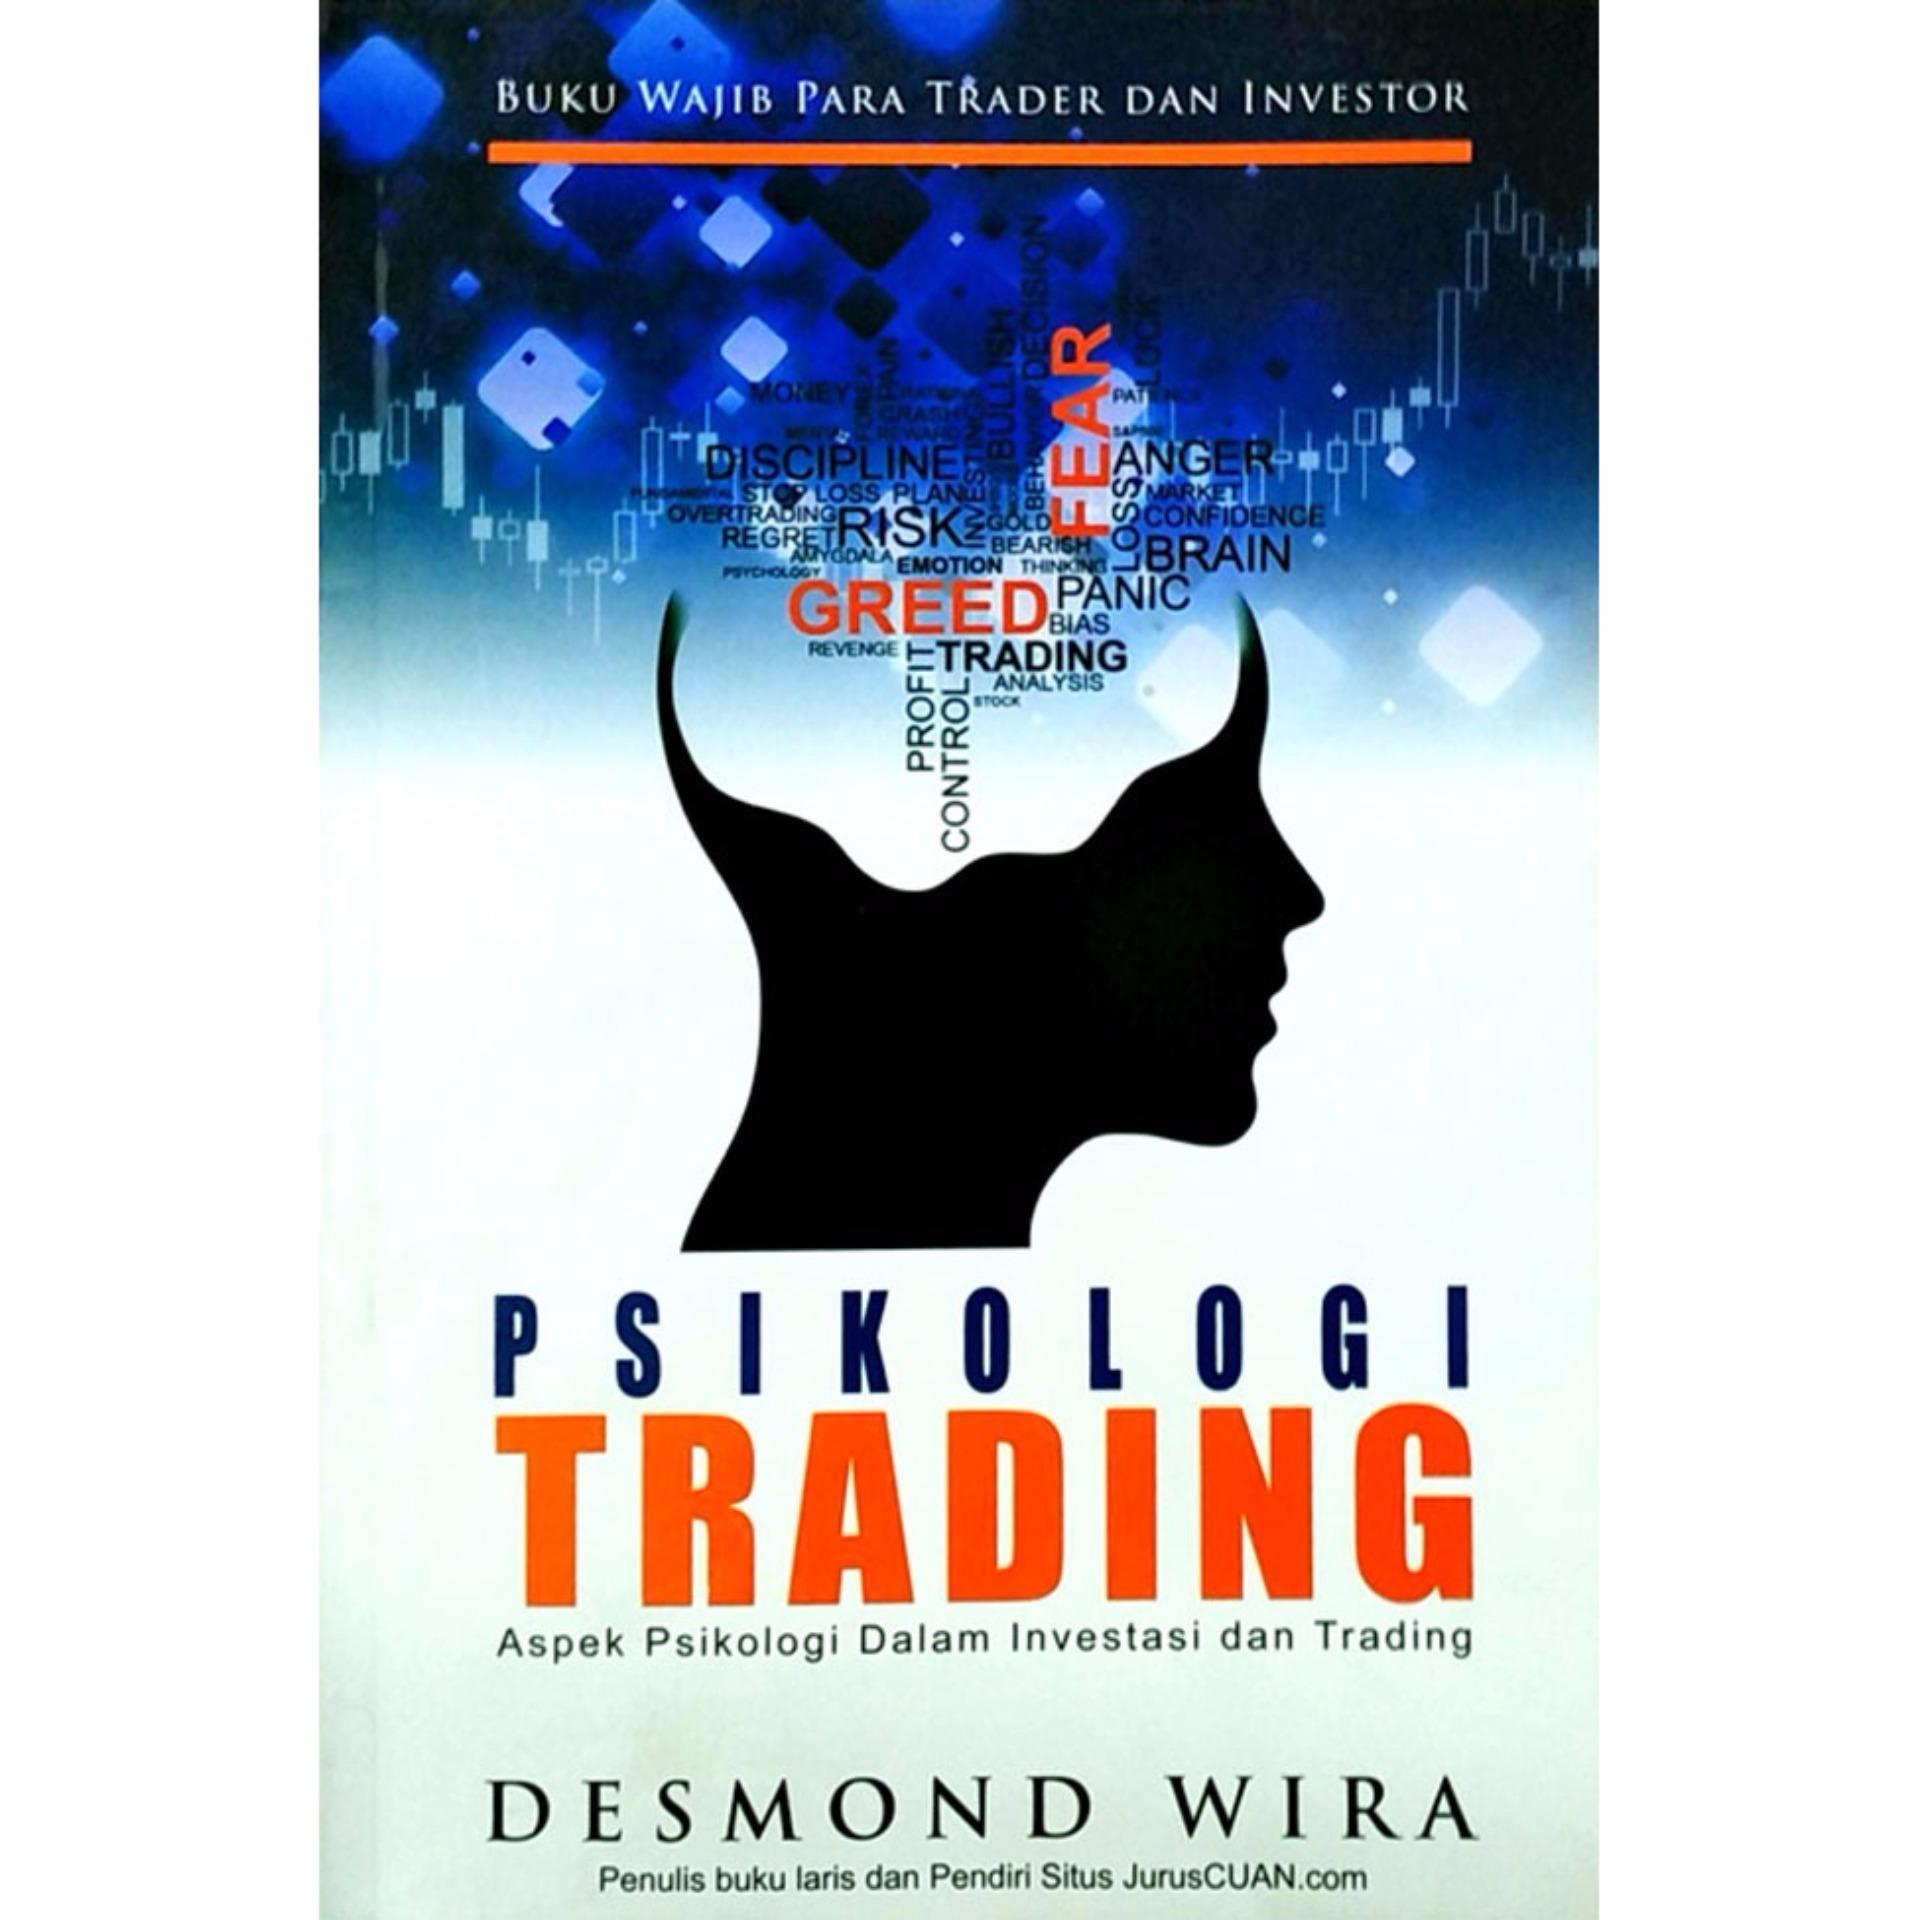 Cheap online Psikologi Trading : Aspek Psikologi Dalam Investasi